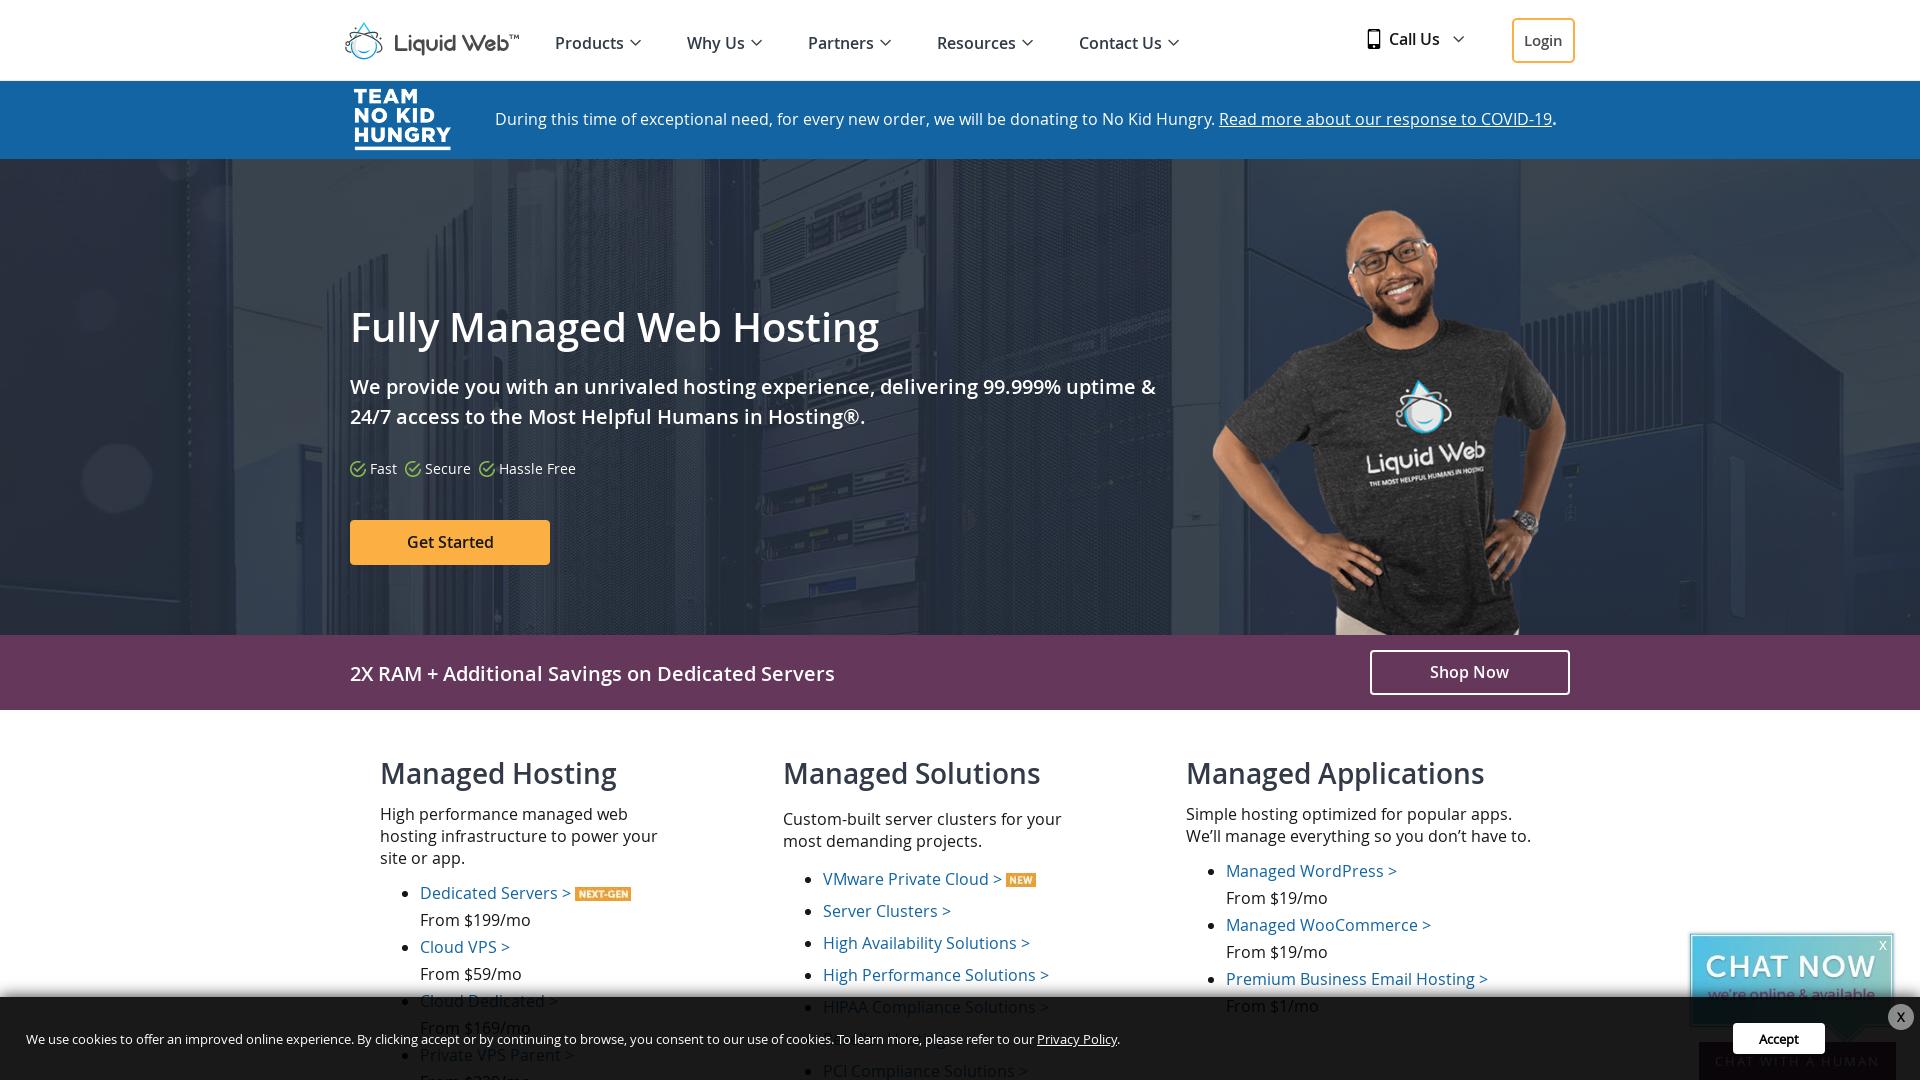 Liquid Web WW website